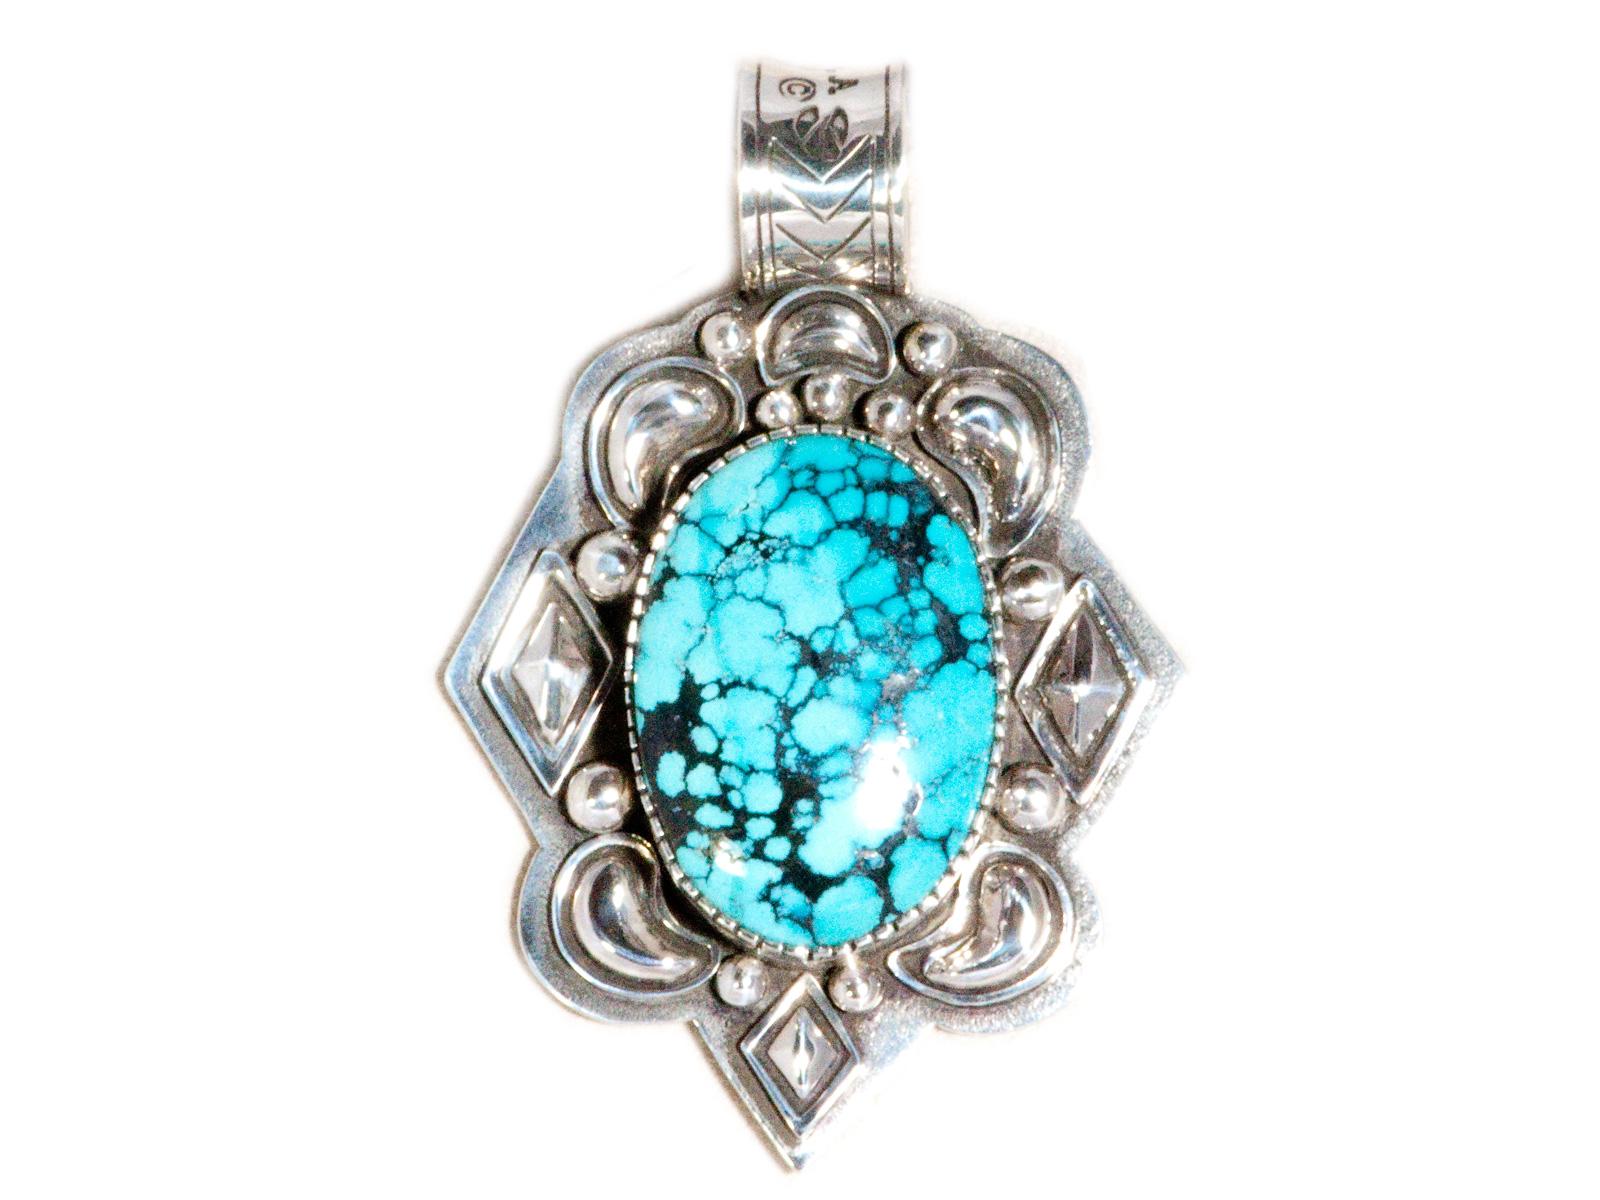 Chinese Turquoise Pendant